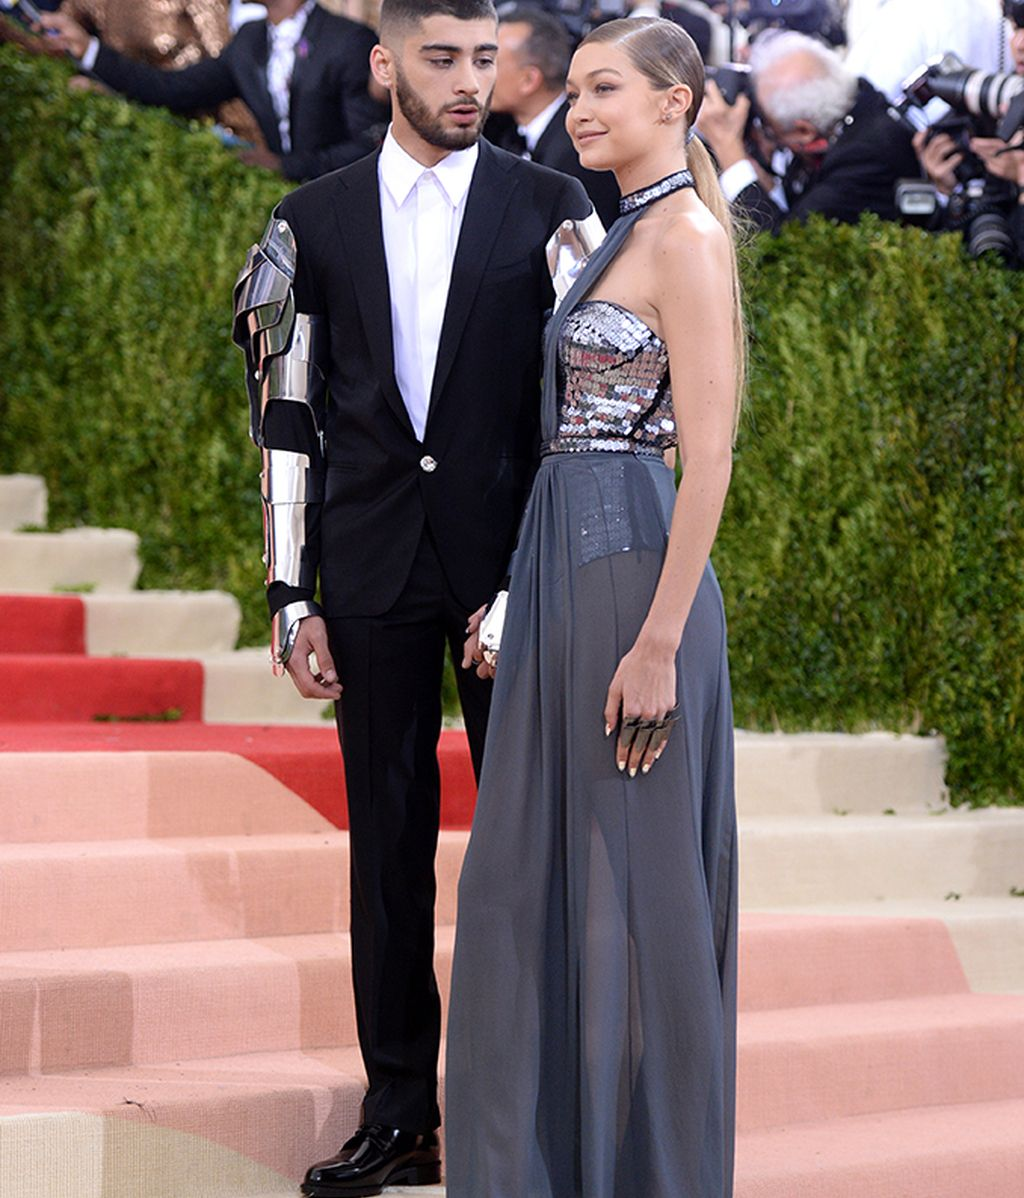 Zayn Malik de Versace y Gigi Hadid de Tommy Hilfiger